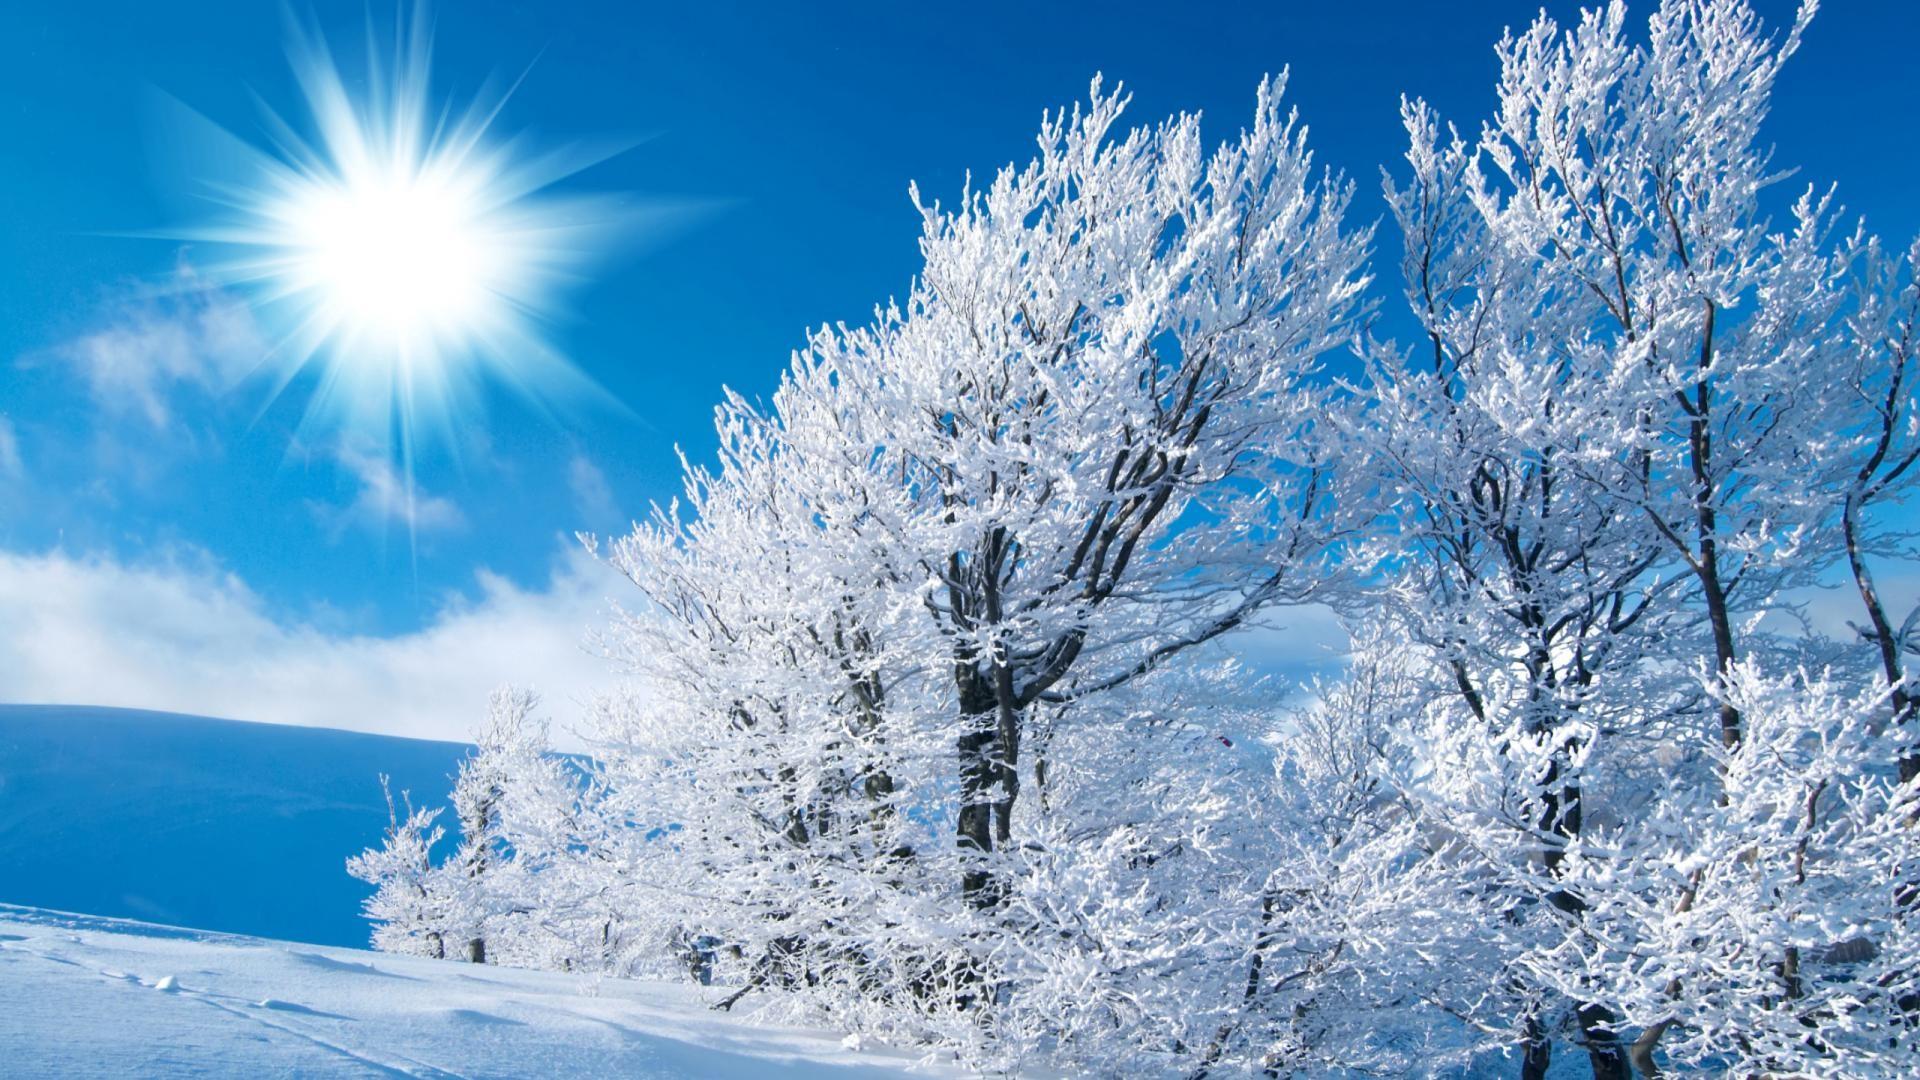 Desktop Wallpapers and Backgrounds | Winter, backgrounds, desktop, wallpaper  – 735248